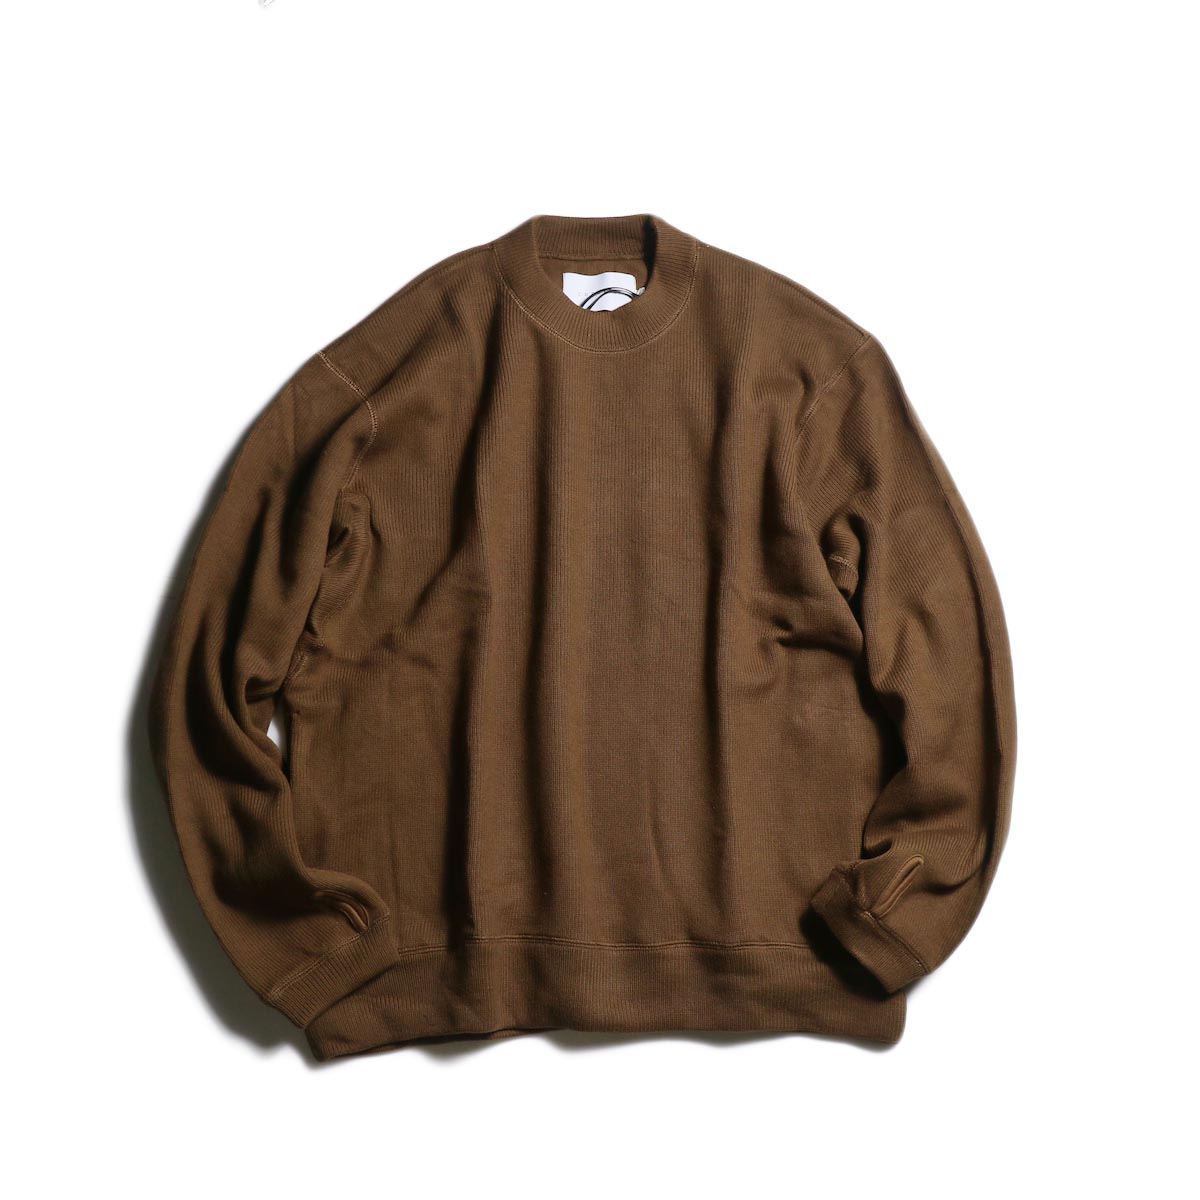 CURLY / LUMPY SWEATER (Brown)